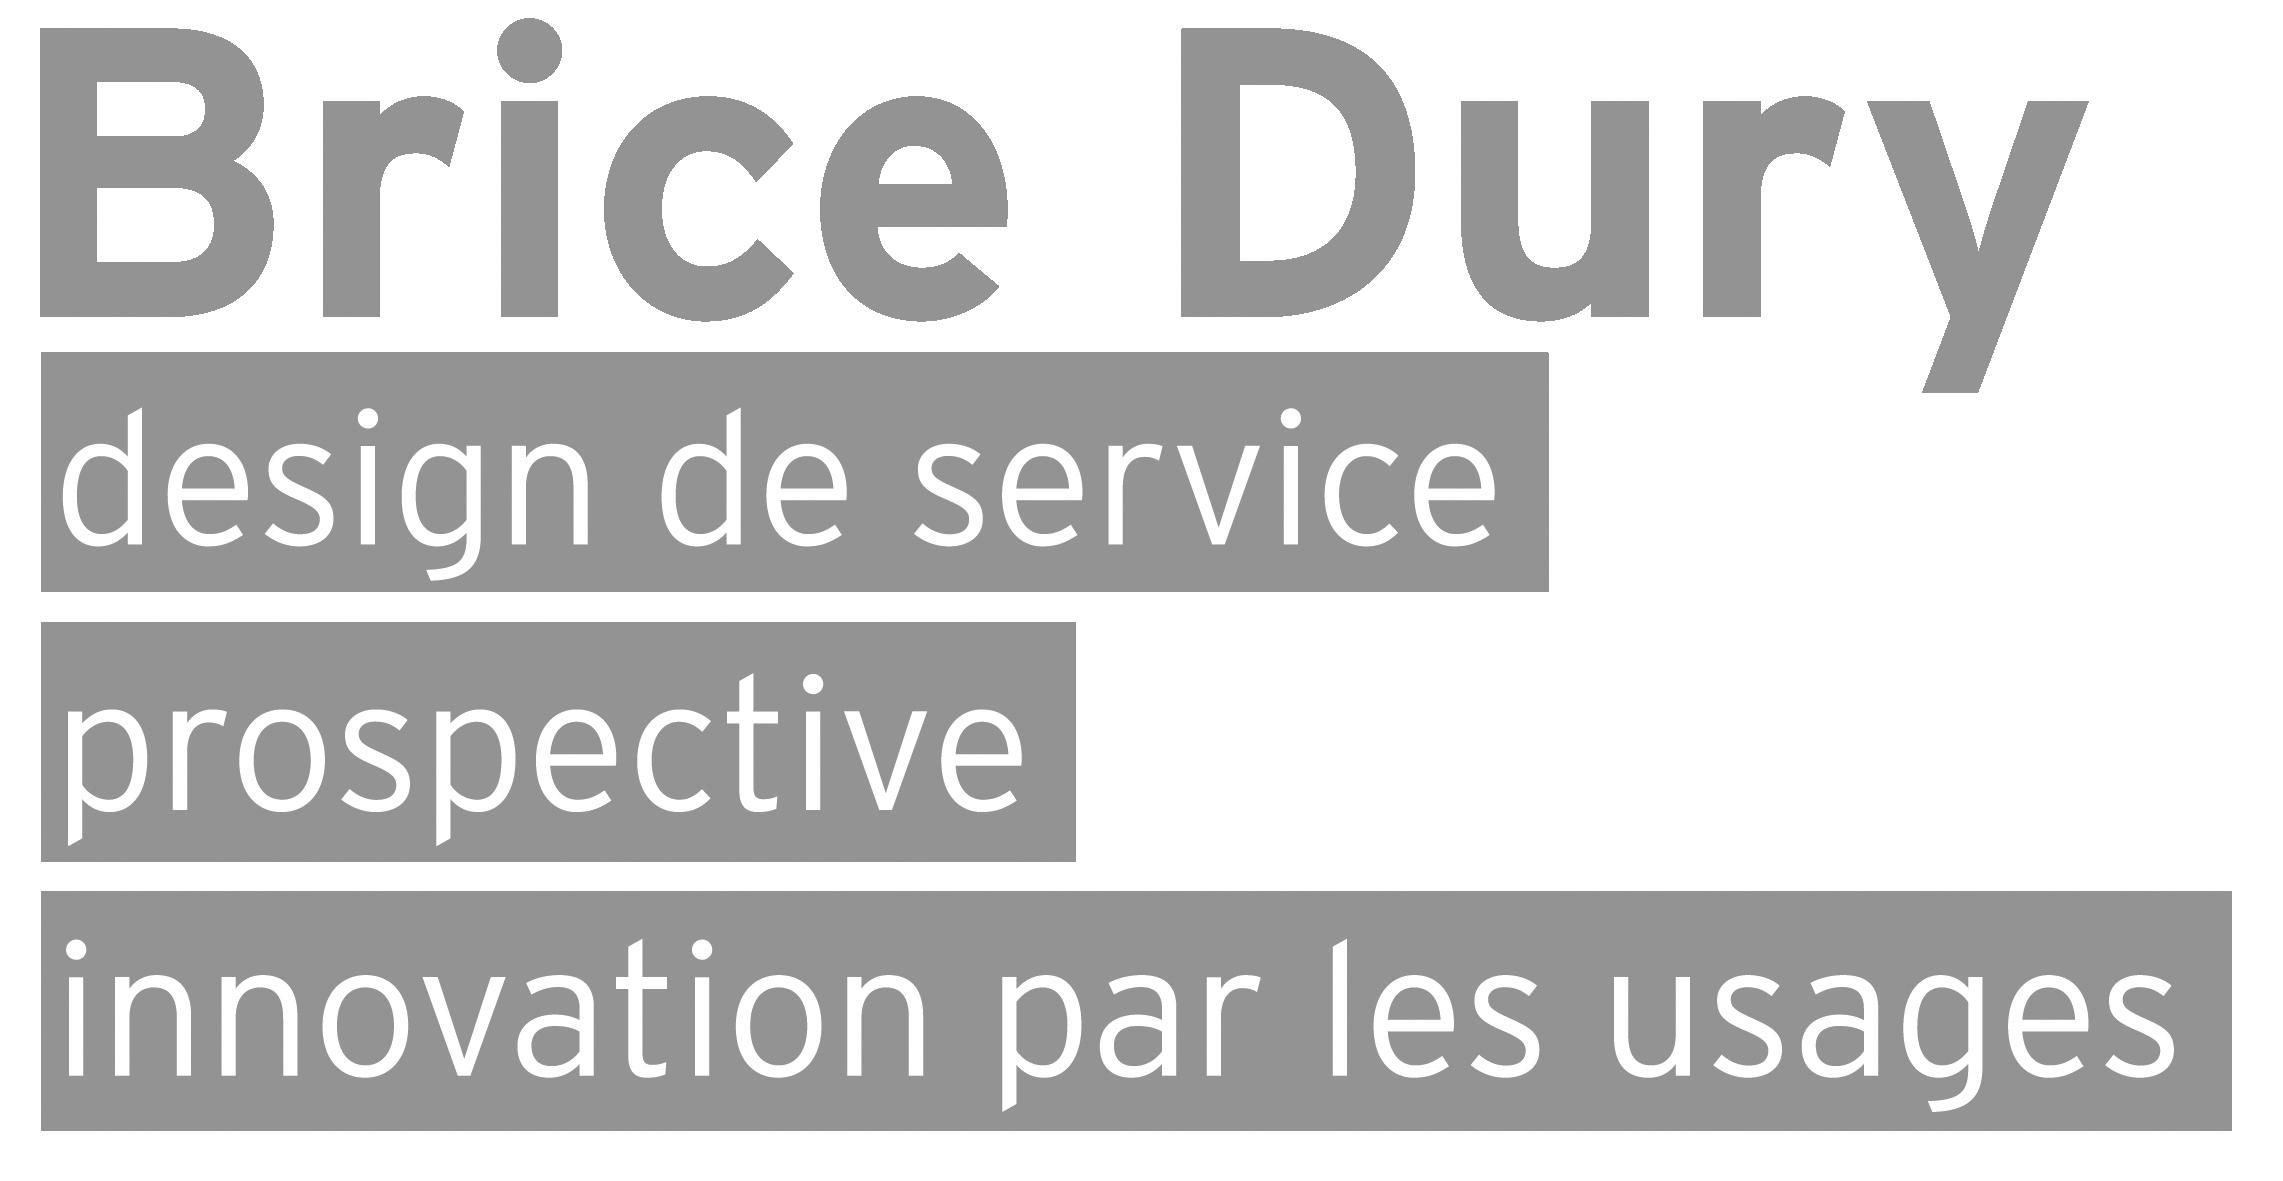 Brice dury